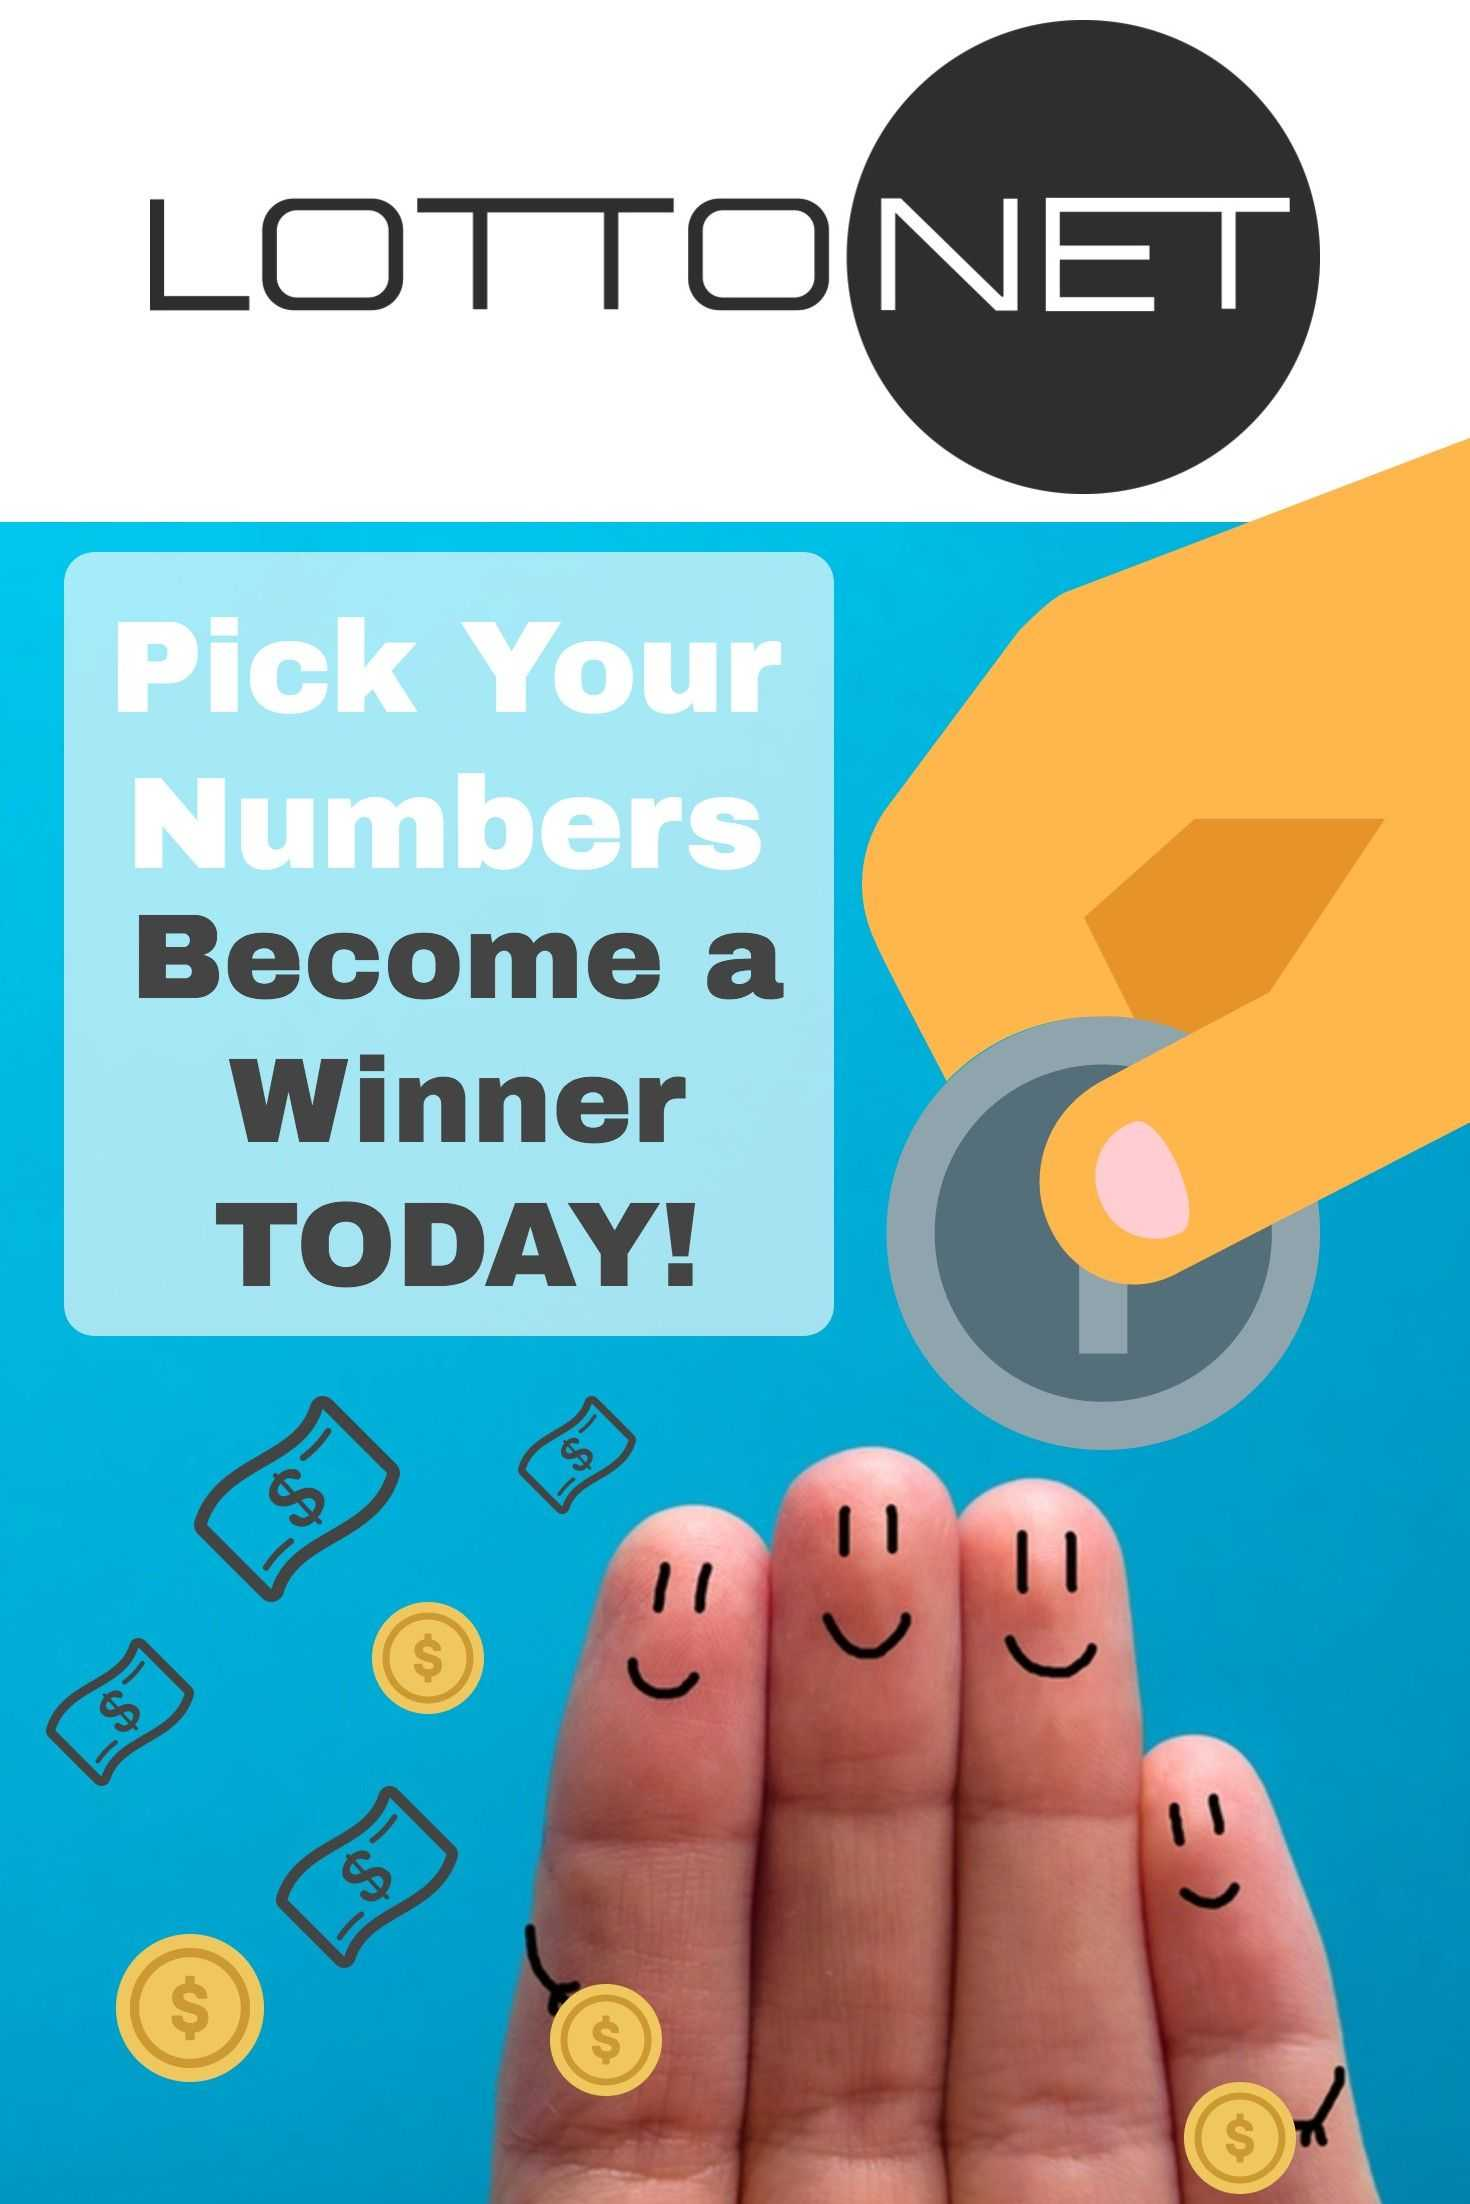 Gratis lotterier